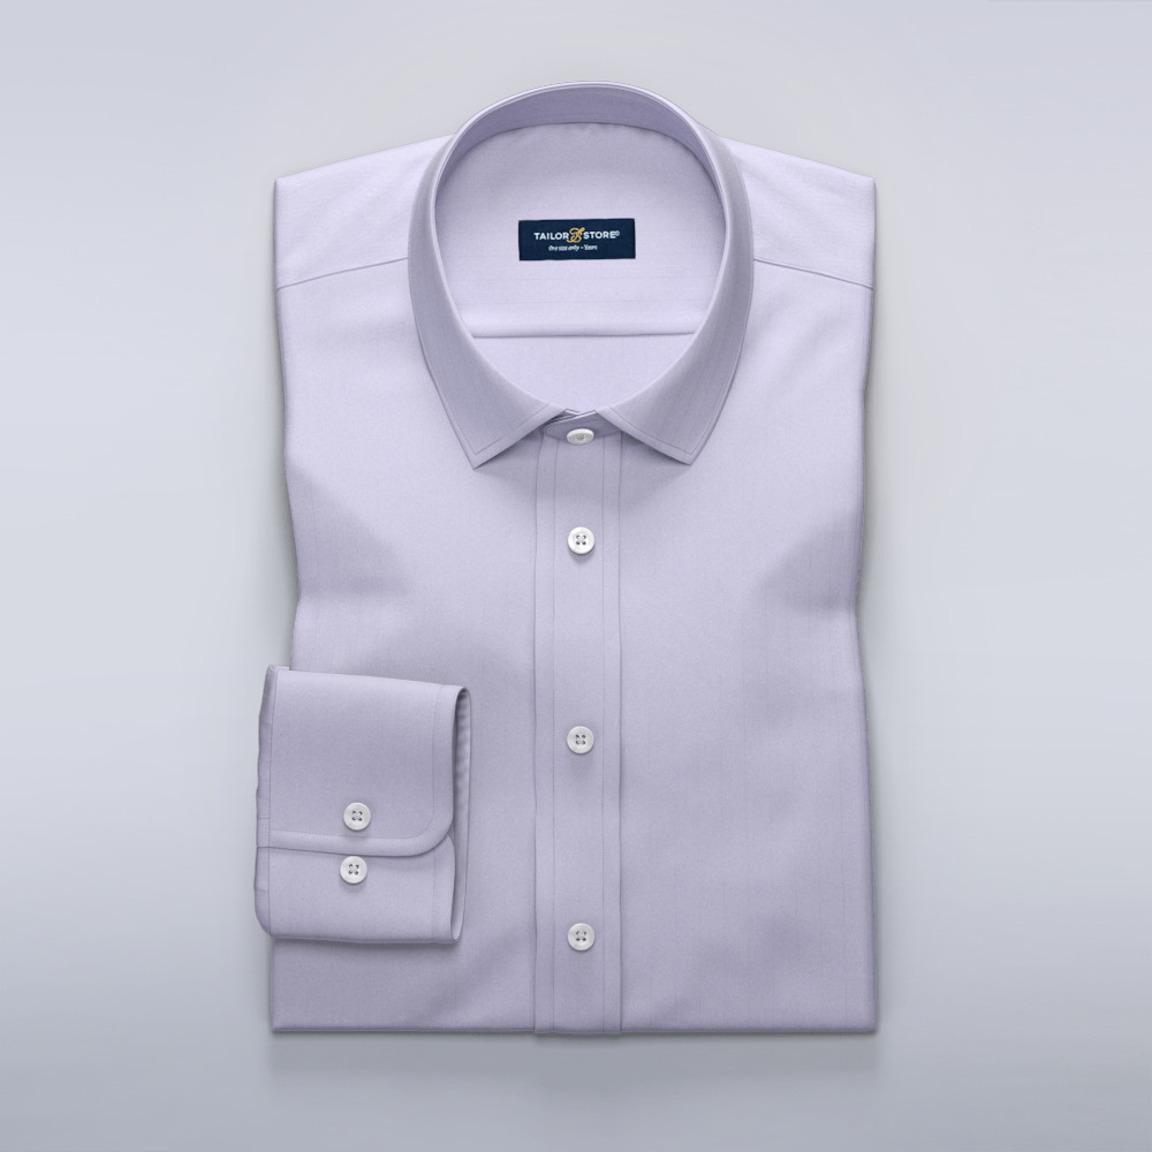 Business-skjorte til damer i luksuriøs lilla sildebensvævning.